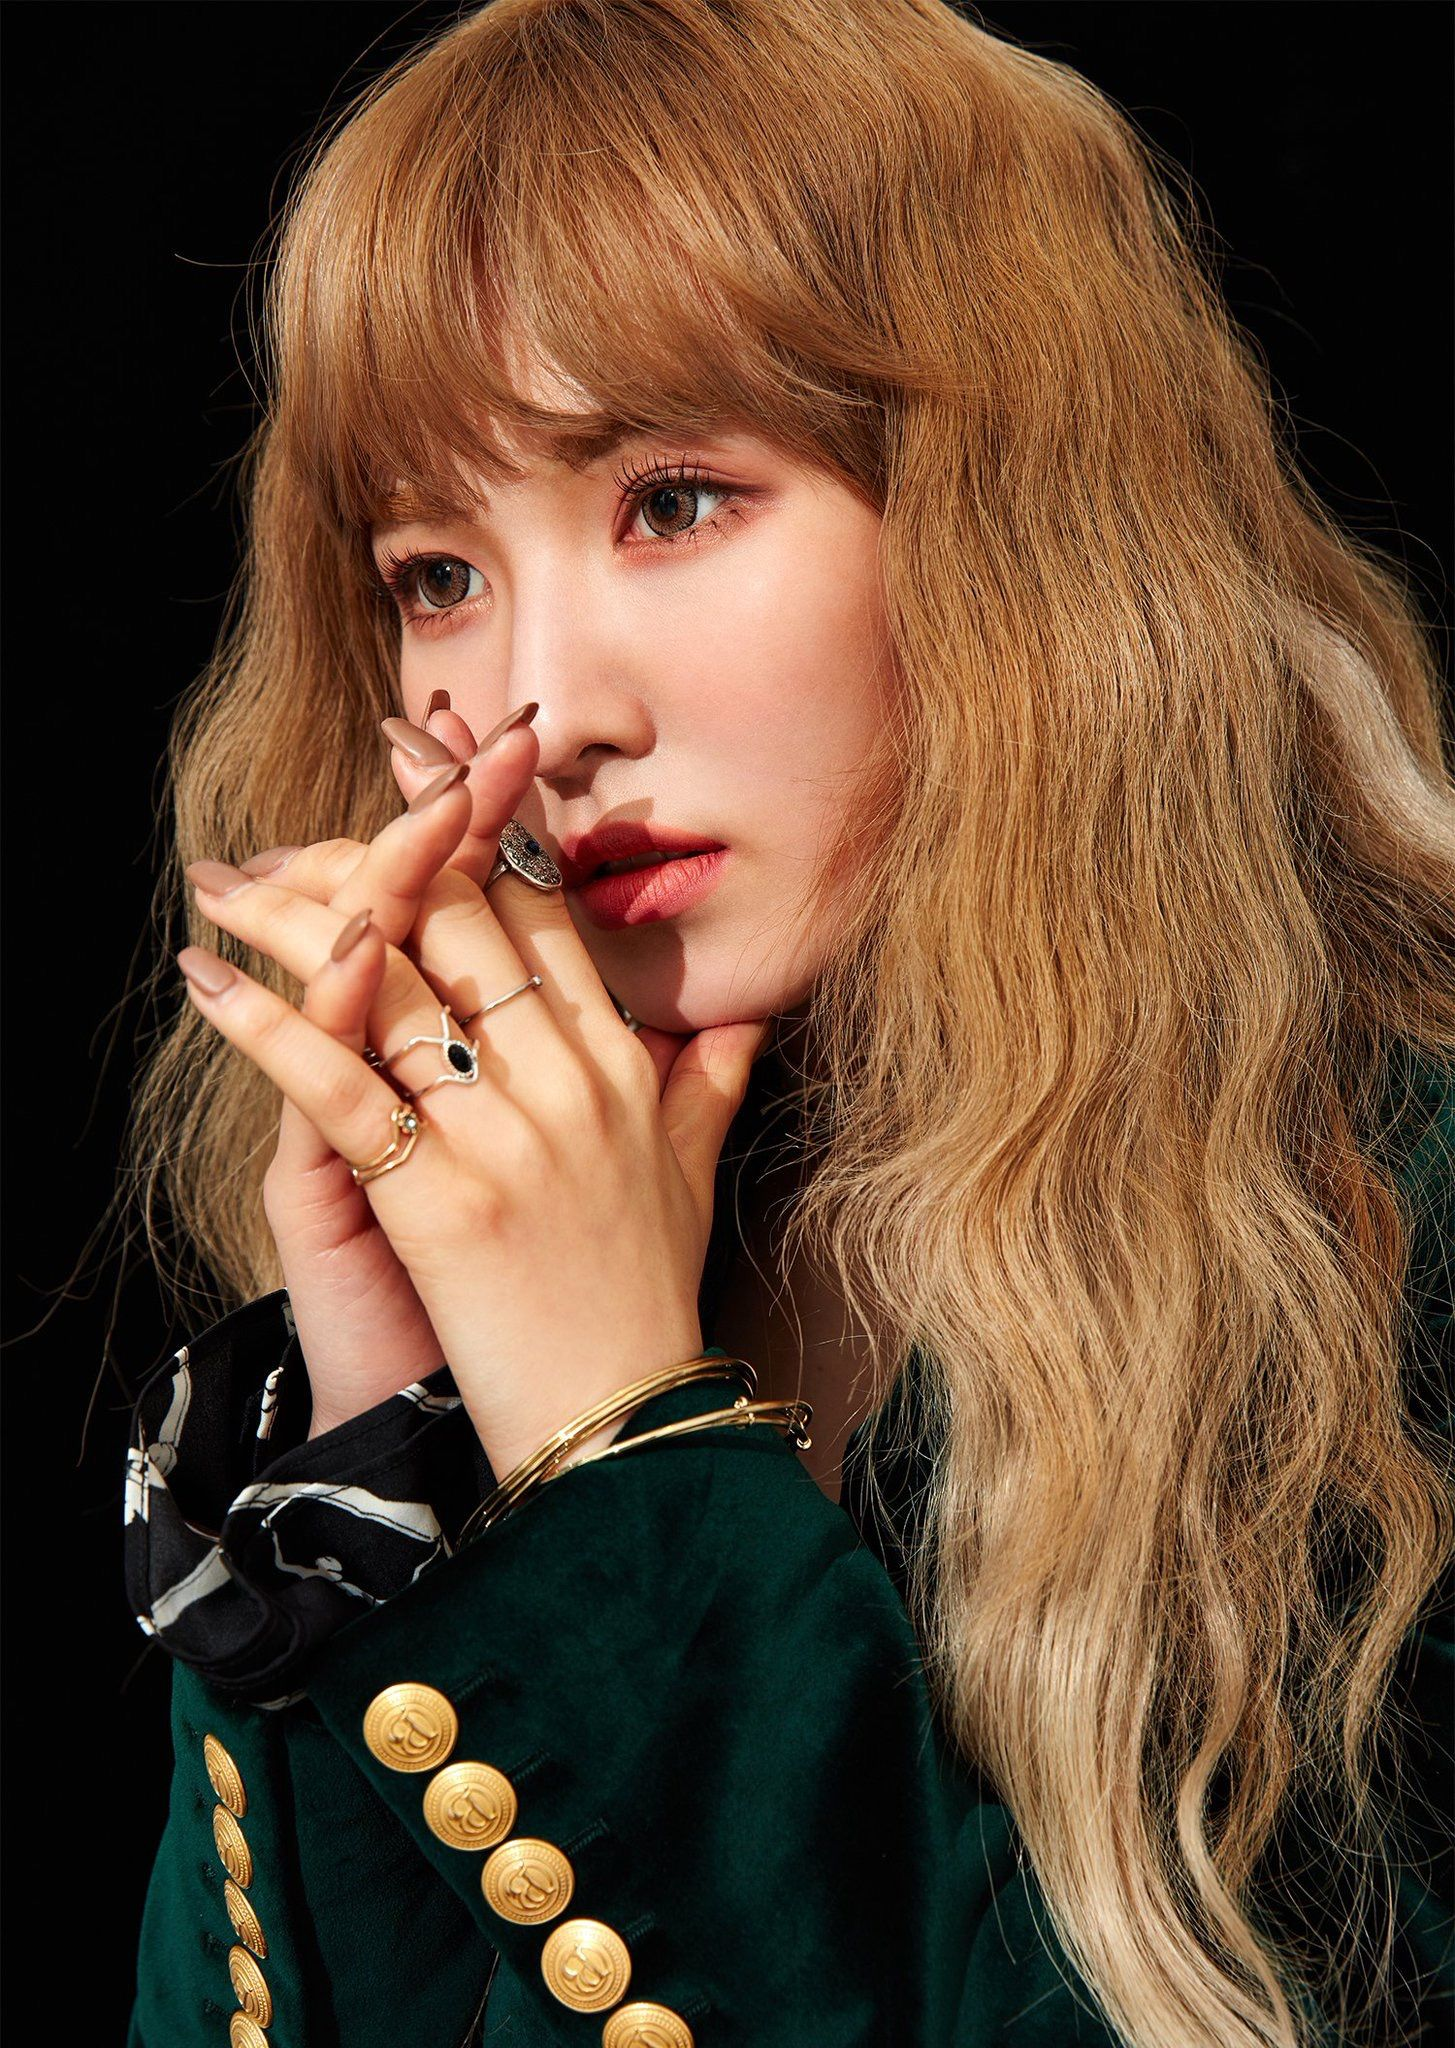 Trend Warna Rambut Pria 2018 Warna Rambut Cokelat Keemasan Warna Rambut Rambut Pria Rambut Cokelat